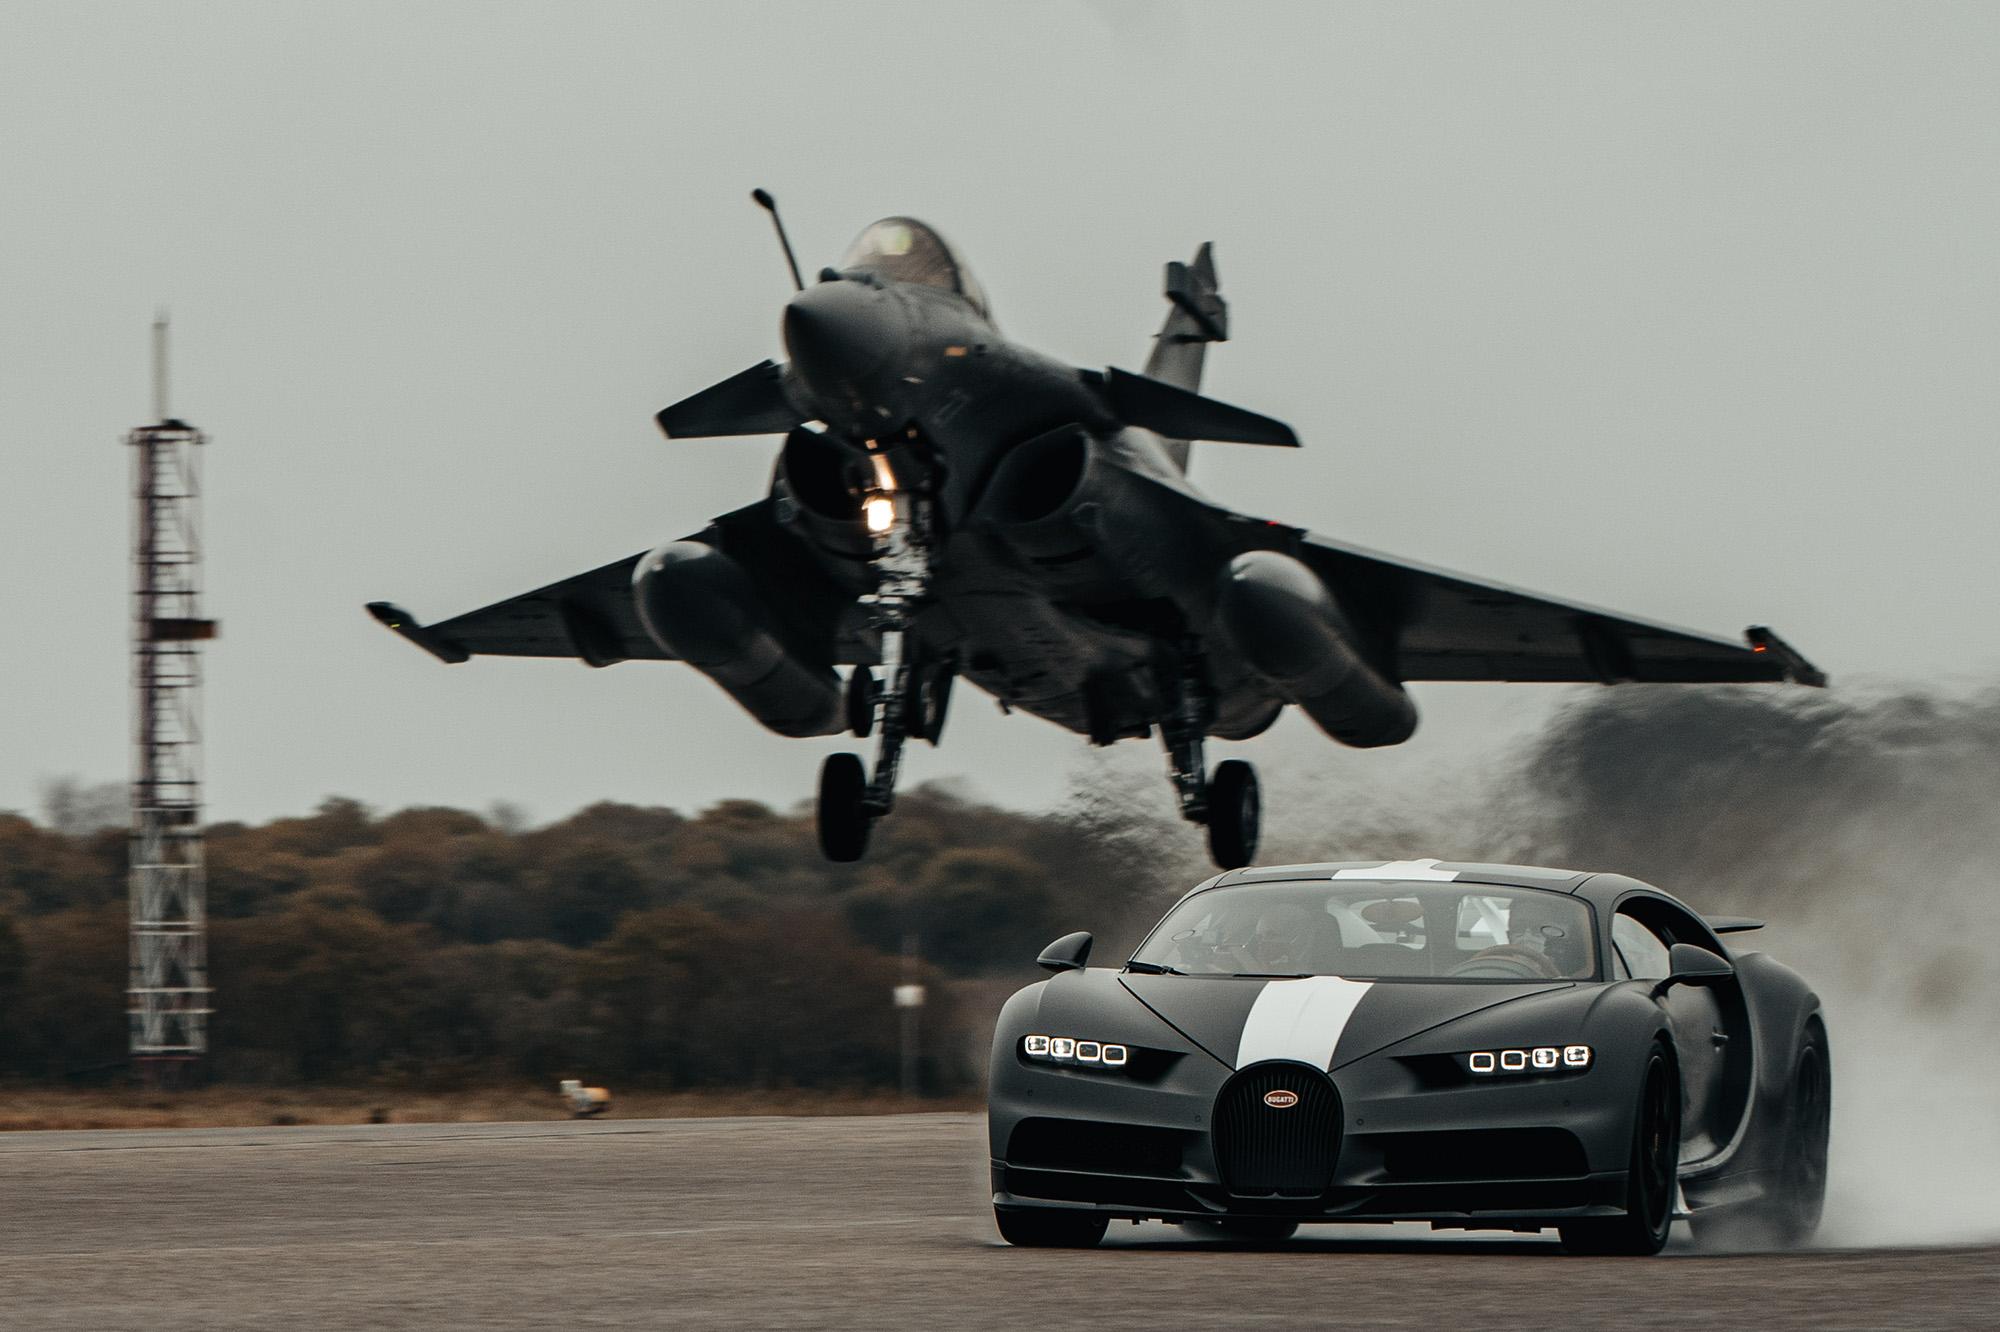 Bugatt Chiron Les Legends du Ciel contra Dassault Rafale Marine